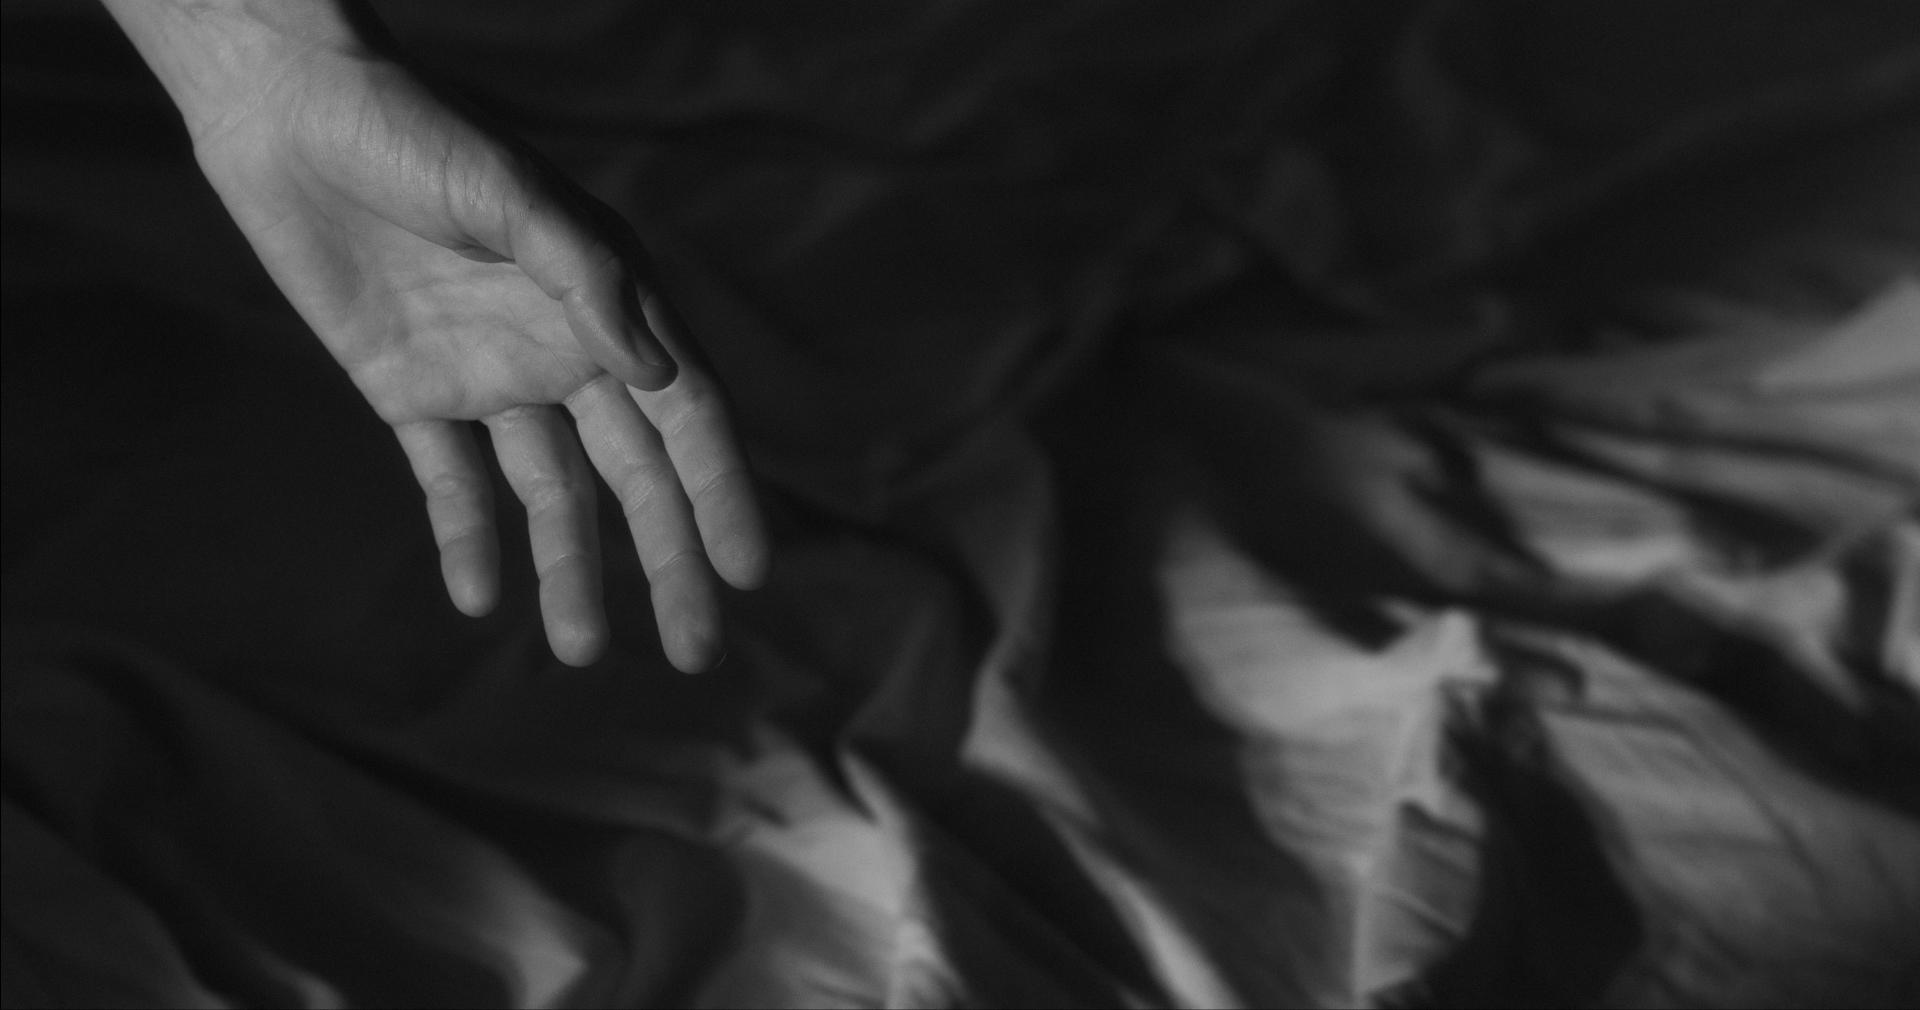 Shadows-Hand.jpg